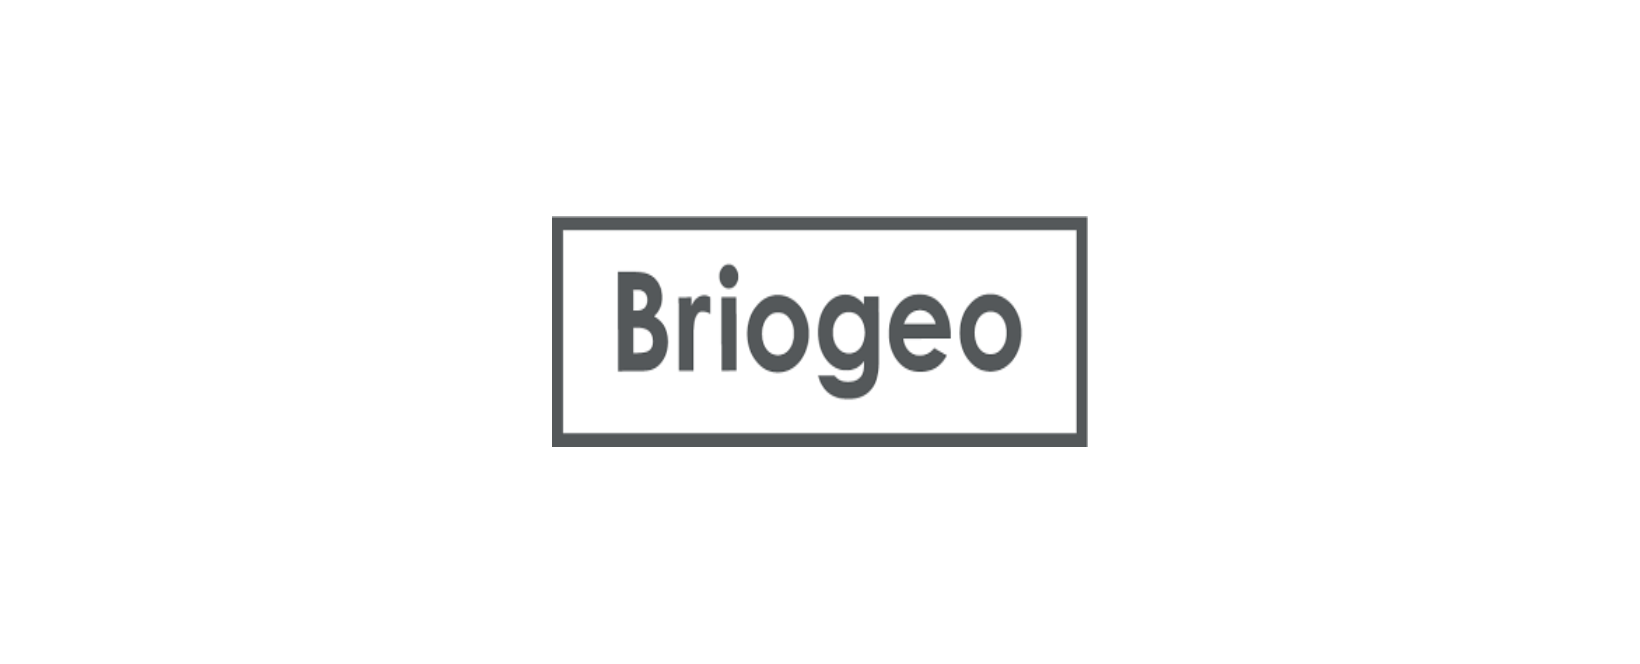 Briogeo Hair Discount Code 2021